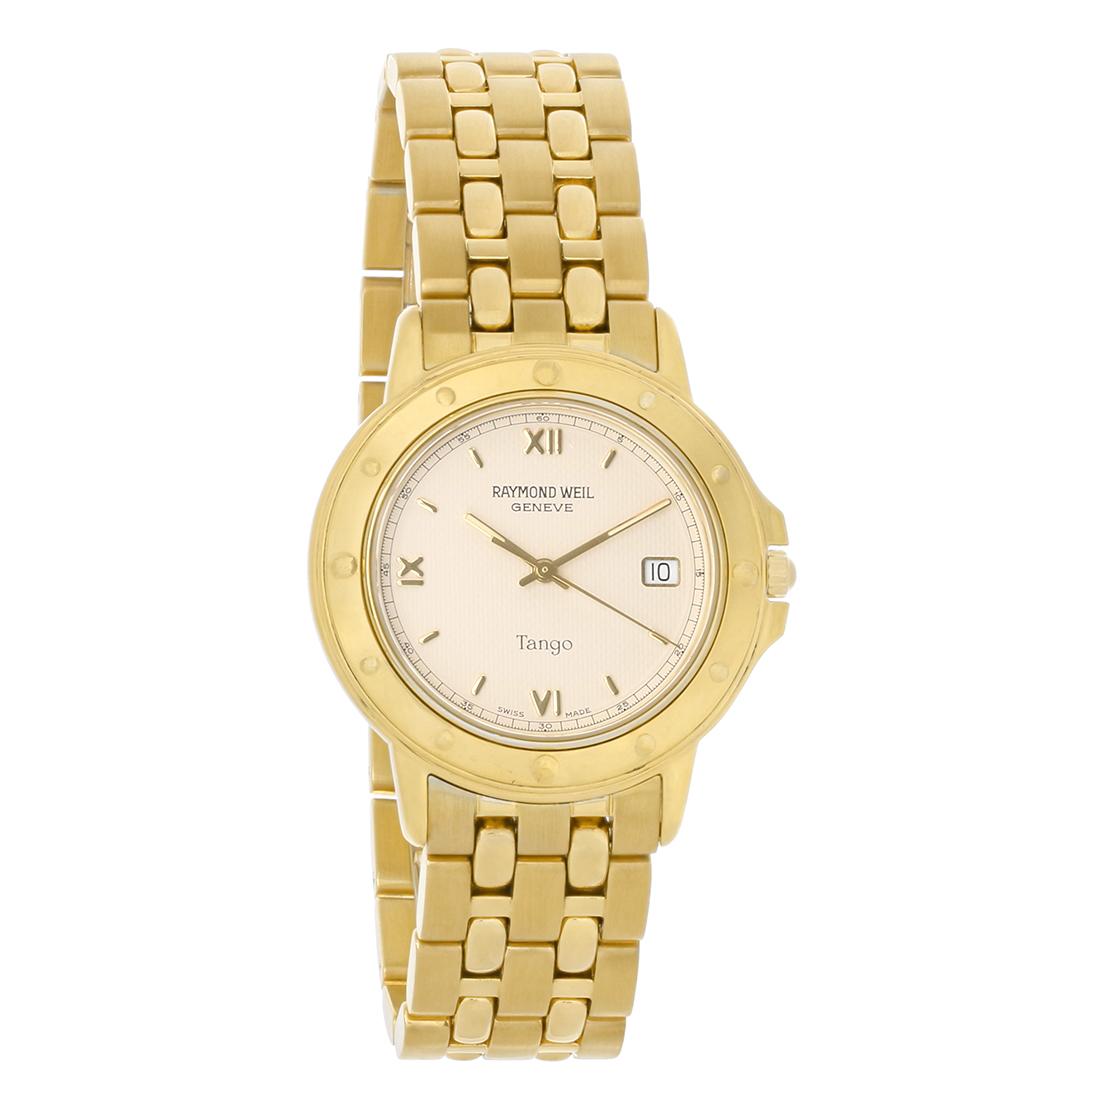 df51e39b86a Raymond Weil Tango Mens Gold Plated Stainless Steel Swiss Quartz Watch  5560-G-WI